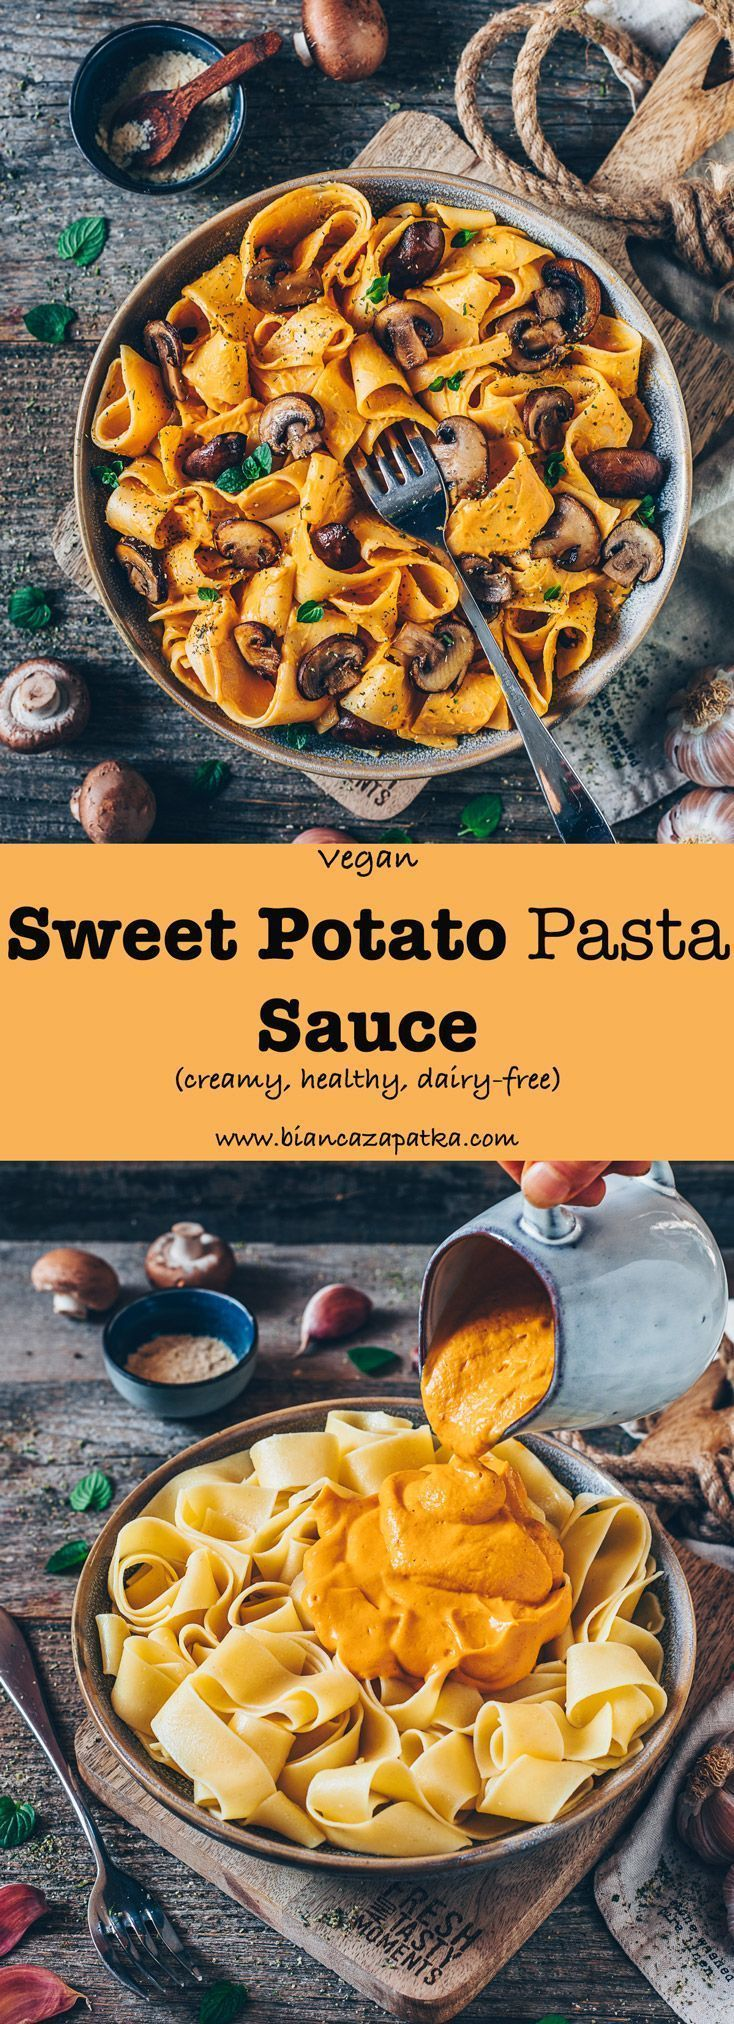 Vegan Sweet Potato Pasta Sauce (creamy, cheesy) #bianca #cheesy #creamy #fitness..., Baking #best Th...